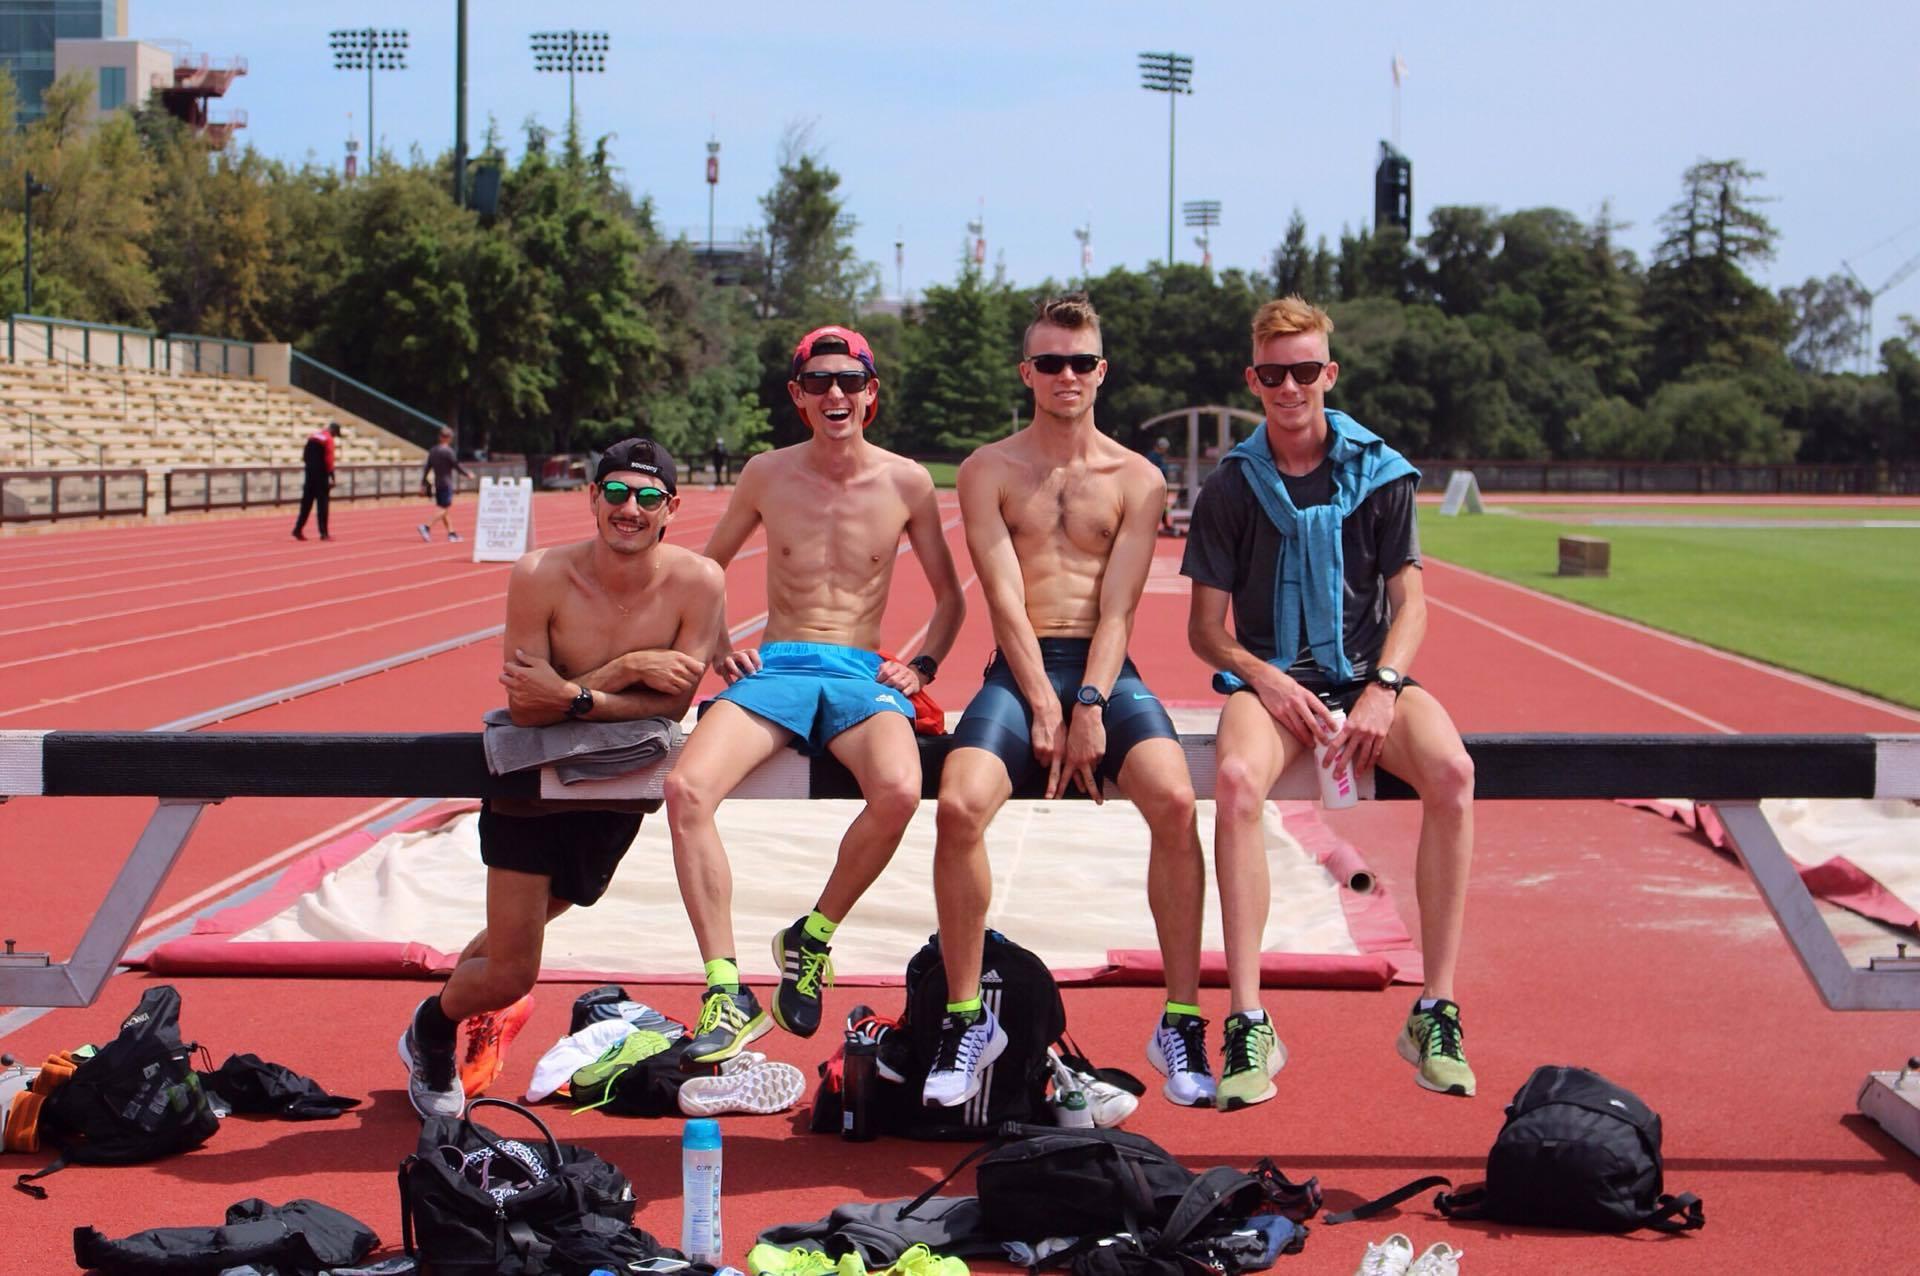 Jordan Gusman, Joshua F. Johnson and Matt Dempsey at Stanford Cobb Track and Angell Field.